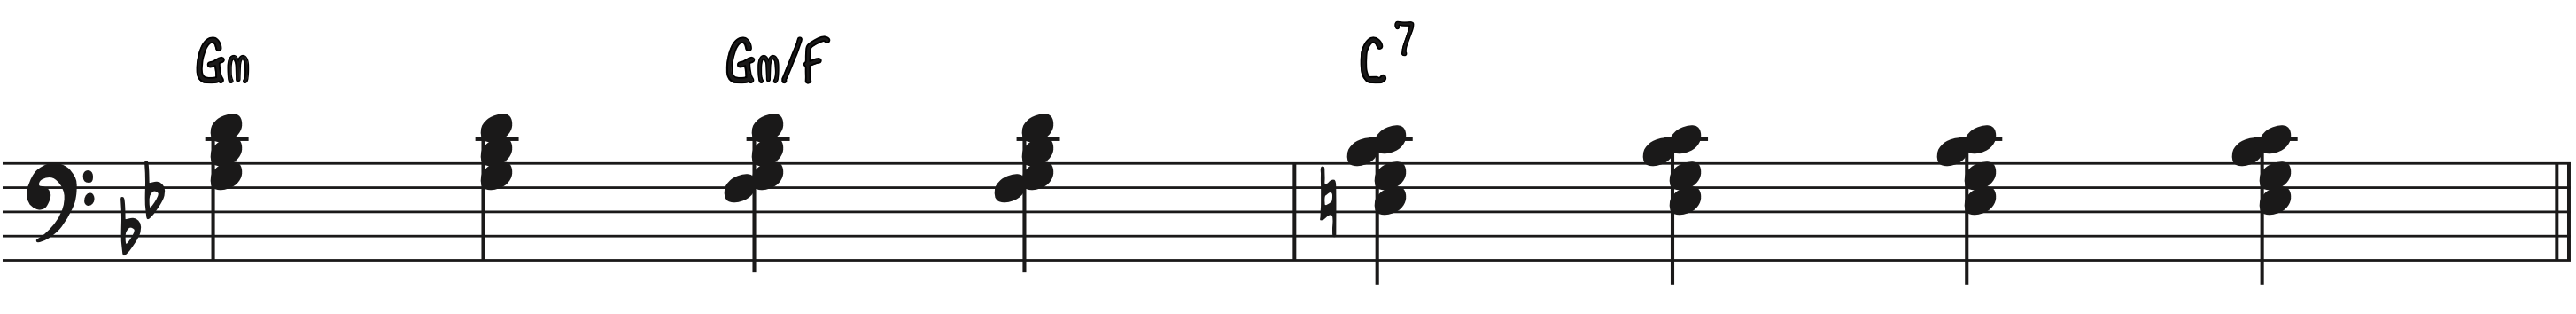 Beginner Rock Piano Accompaniment Left Hand